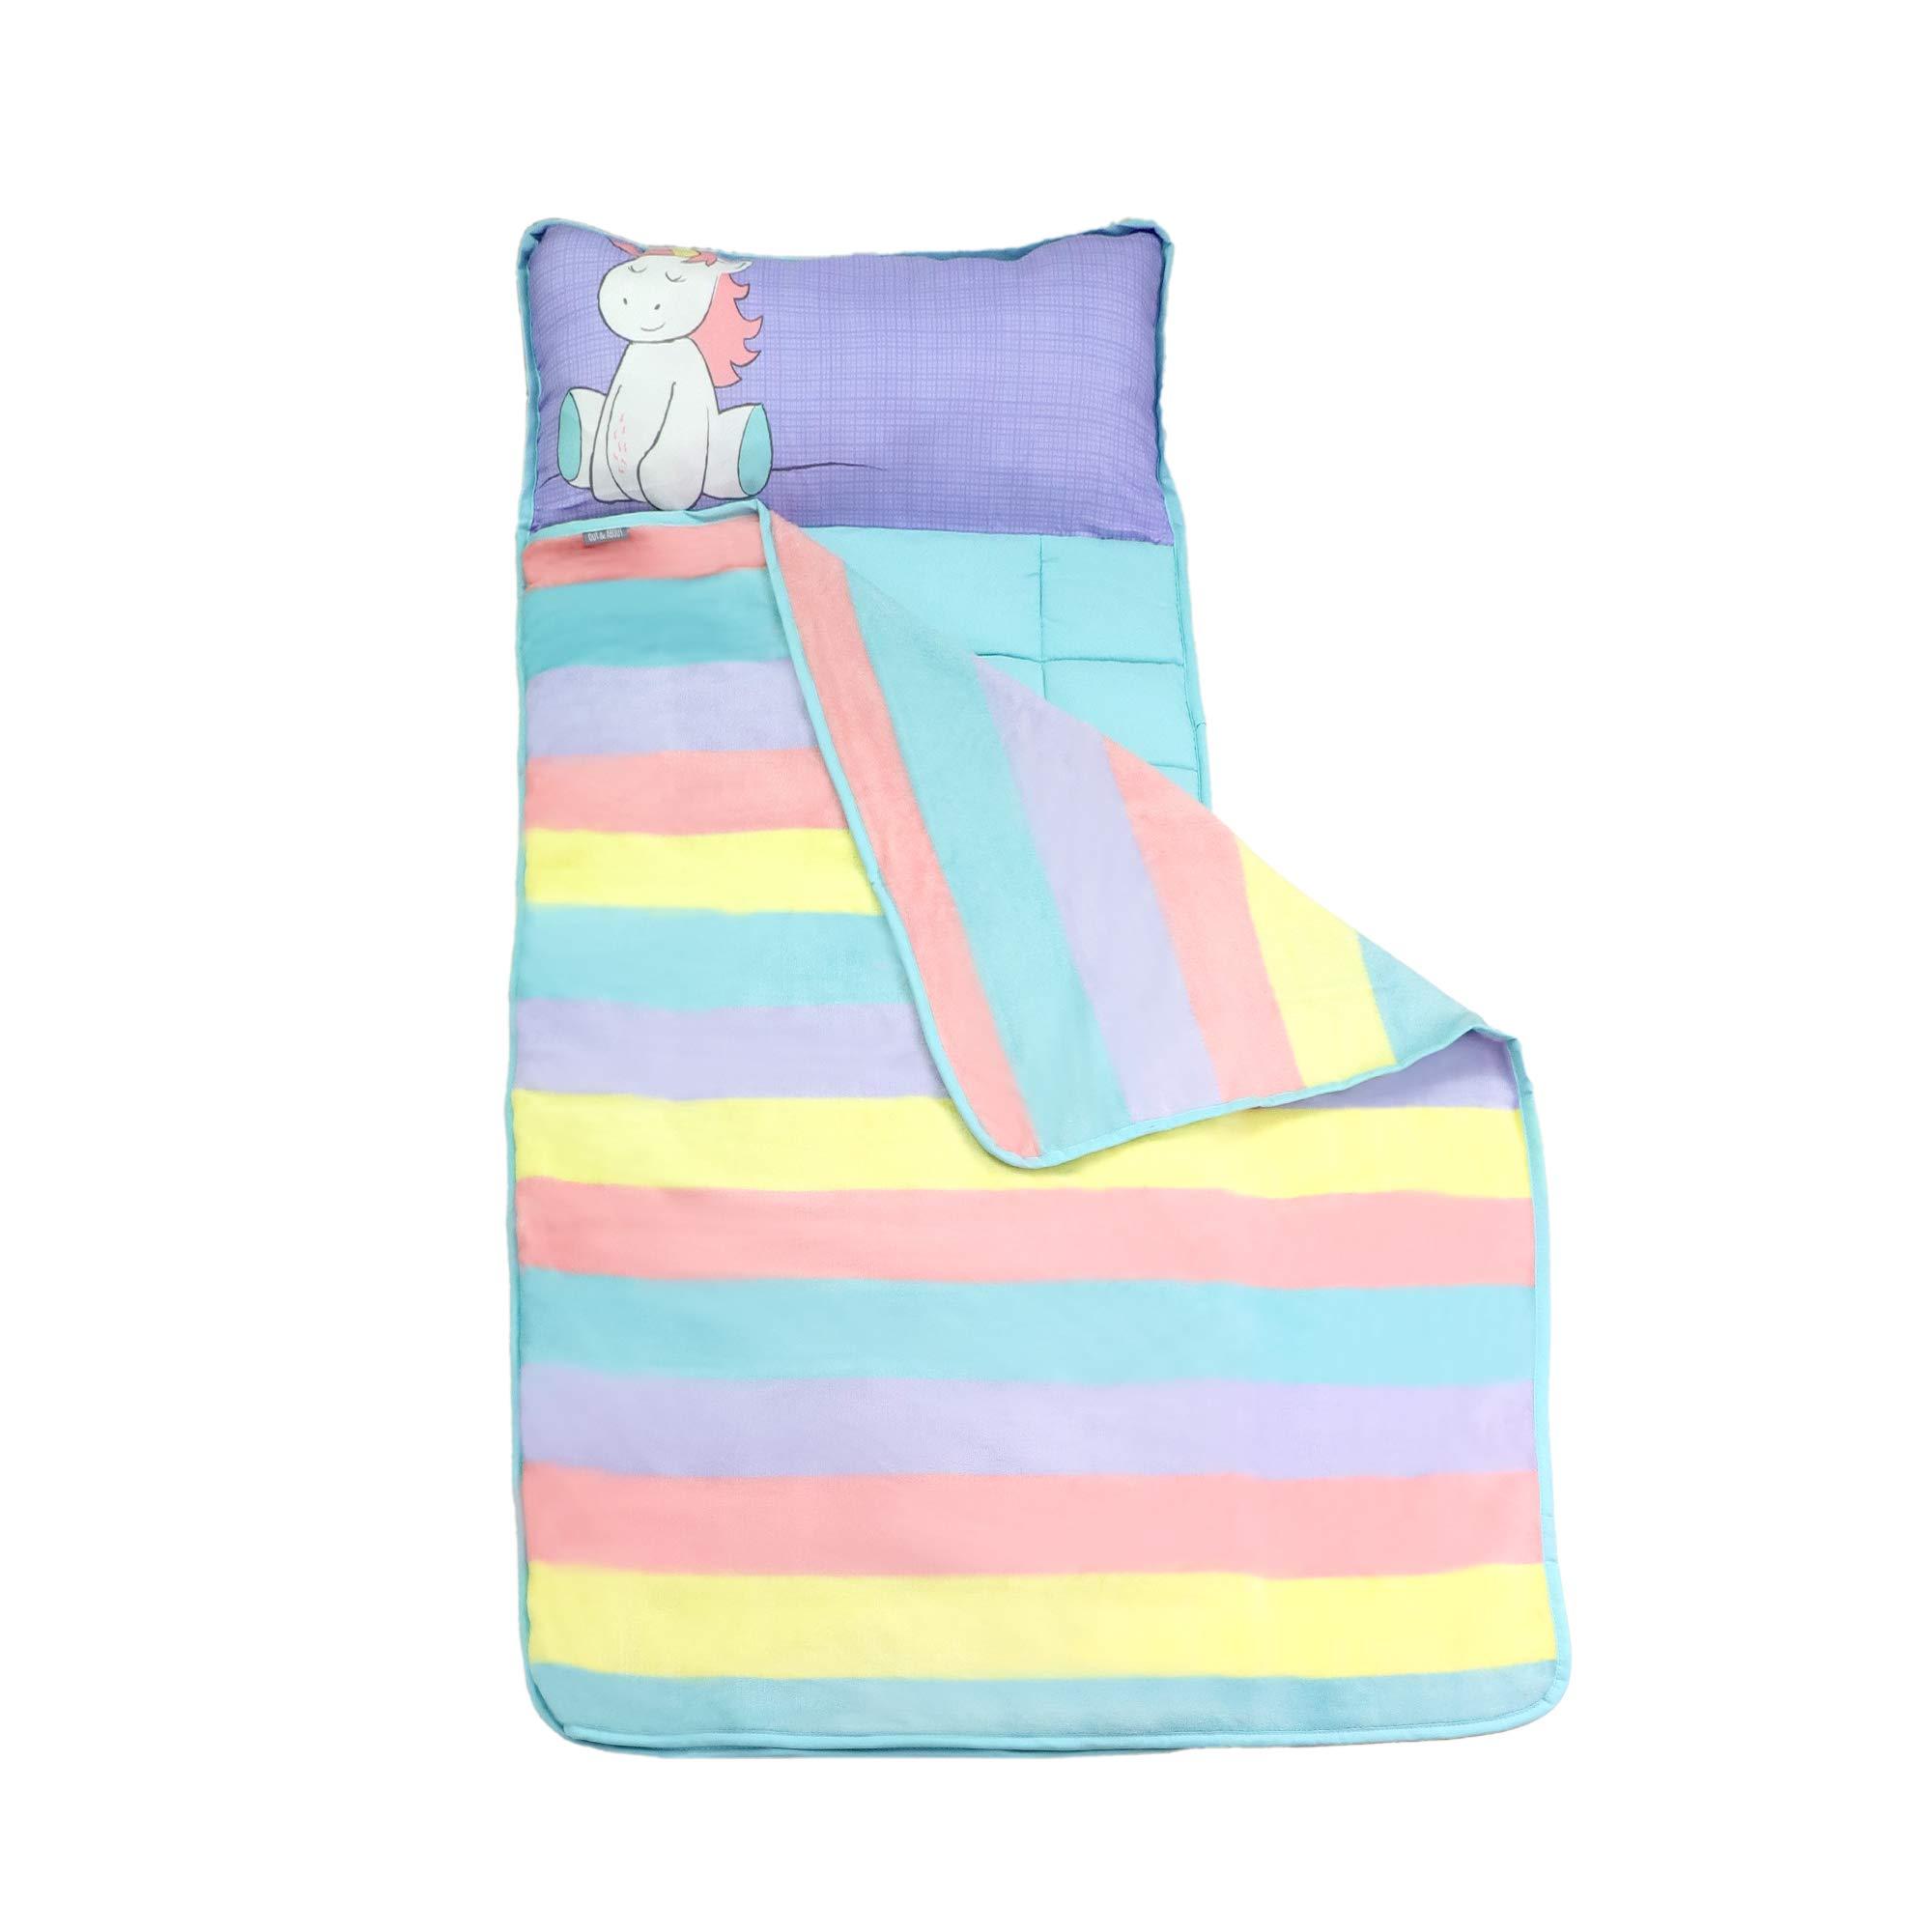 Toddler Nap Mats for Preschool Kinder Daycare - Blanket + Pillow for Boys or Girls - Foldable Comfy Cover (Unicorn)